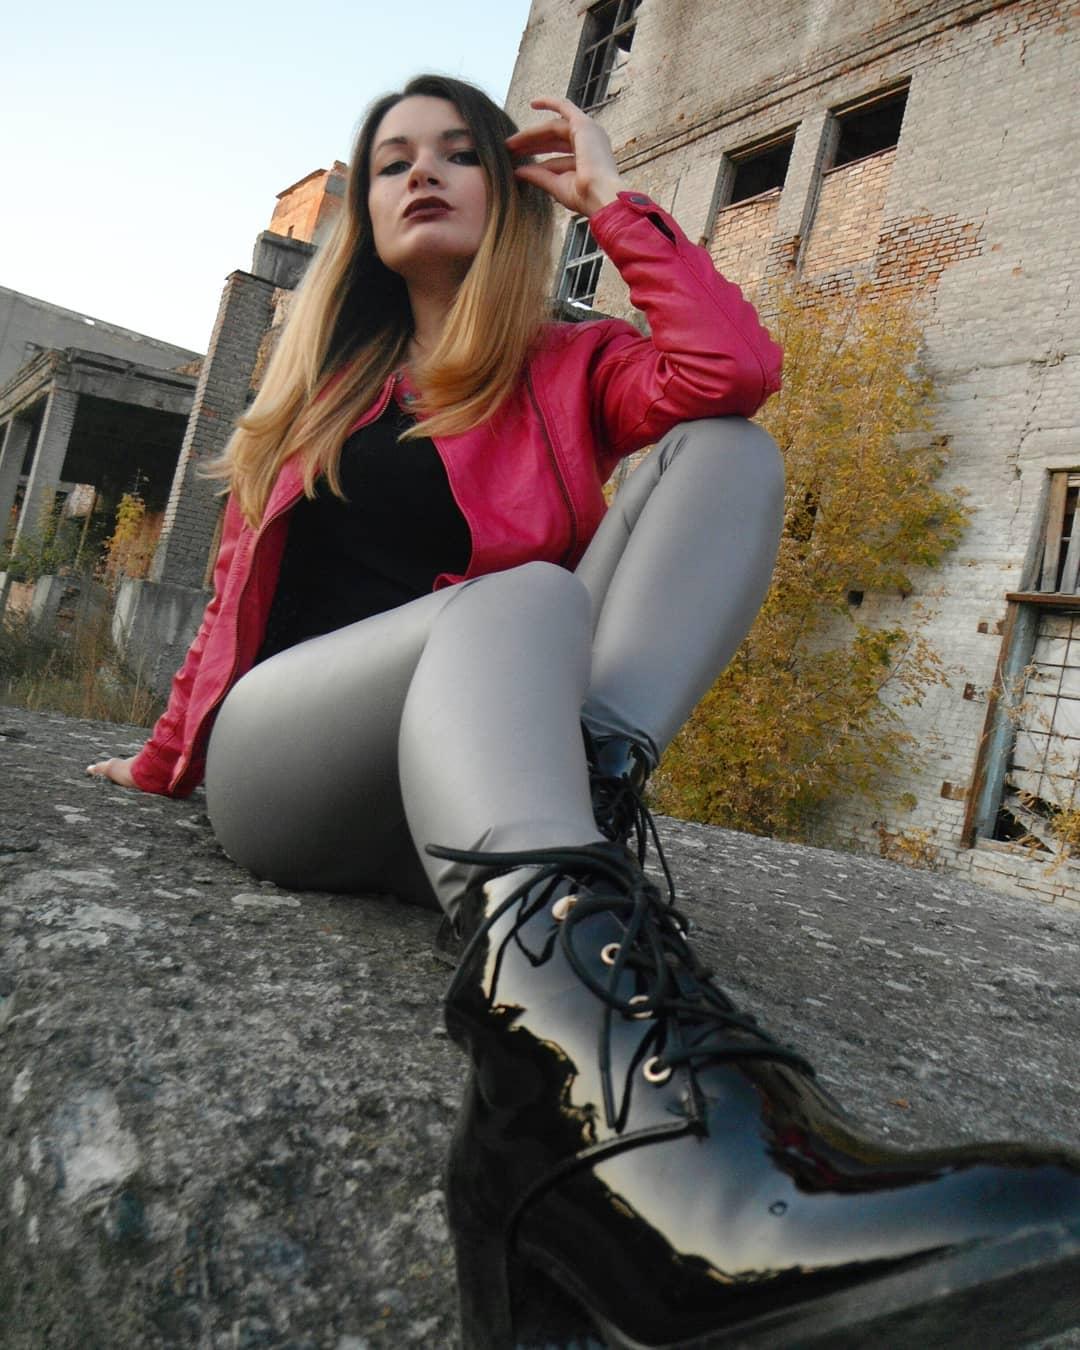 Olga-Madych-Wallpapers-Insta-Fit-Bio-7